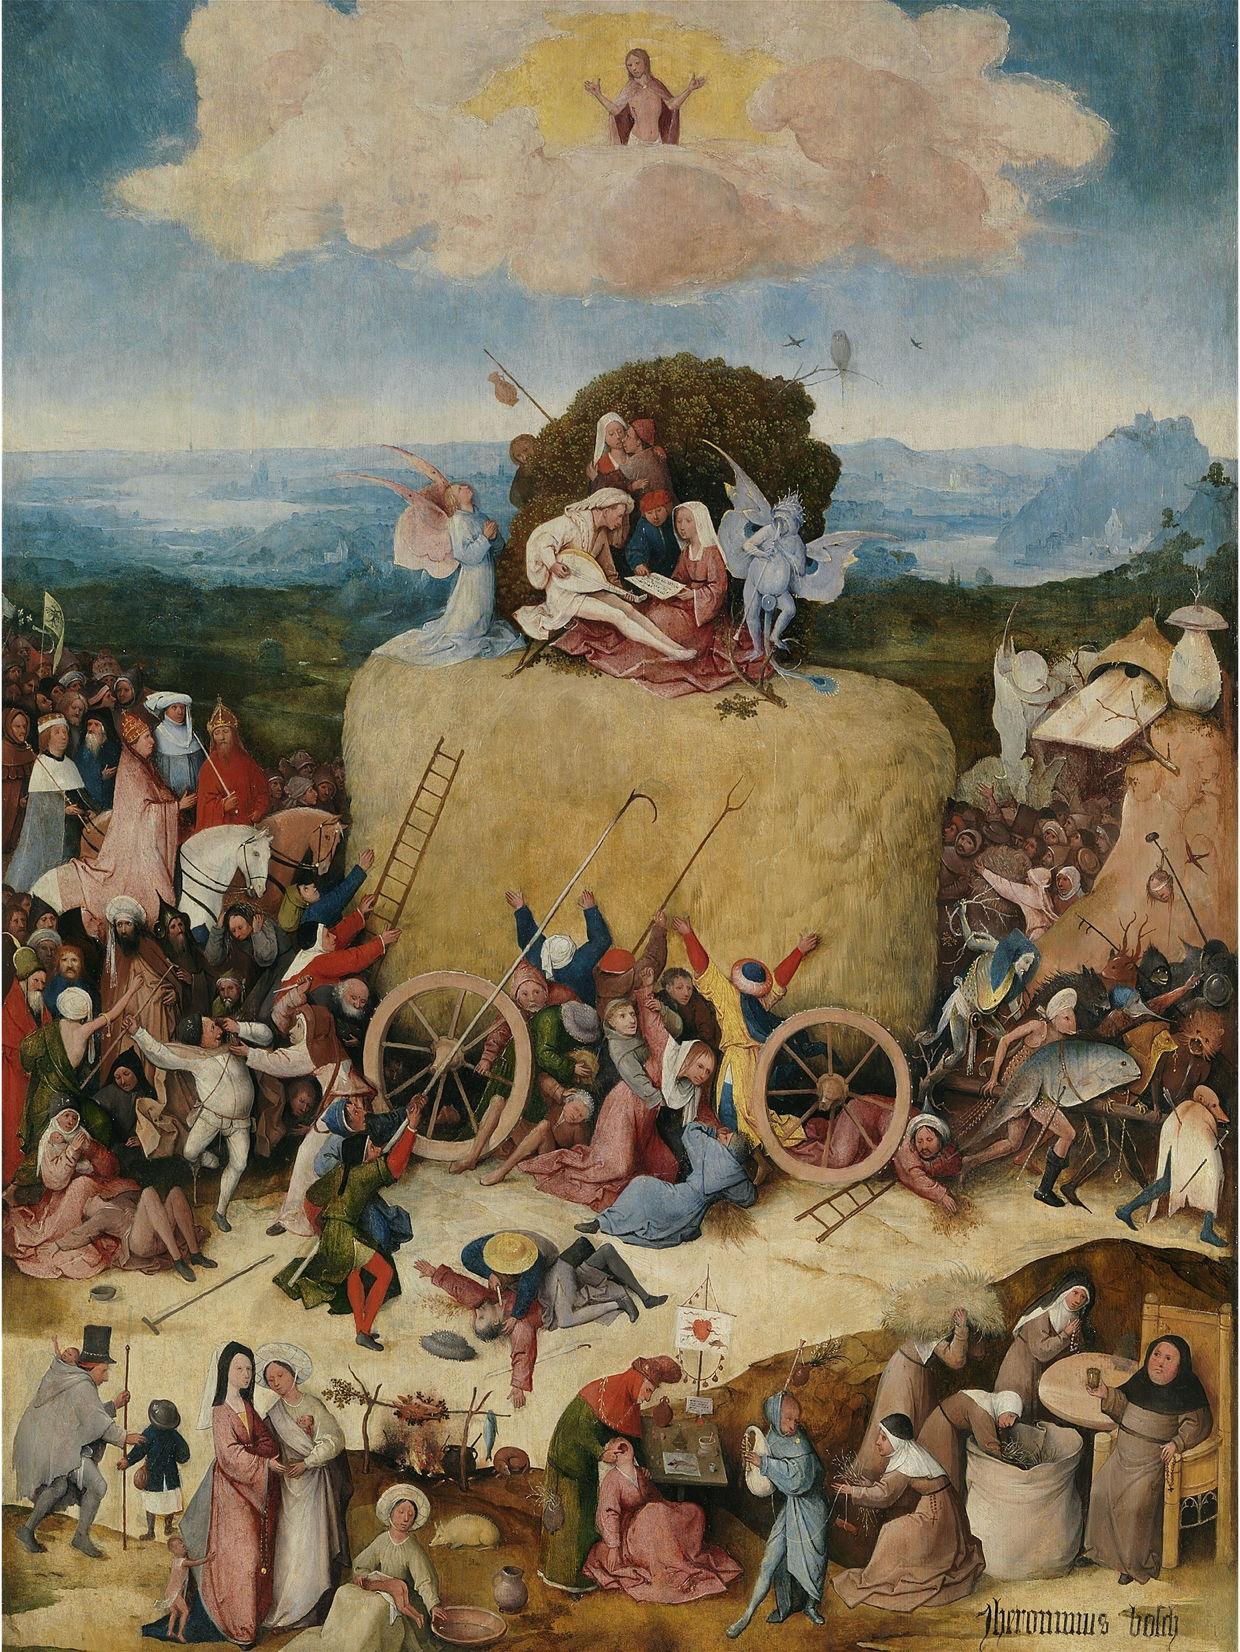 Hieronymus Bosch The Haywain Prado The Eclectic Light